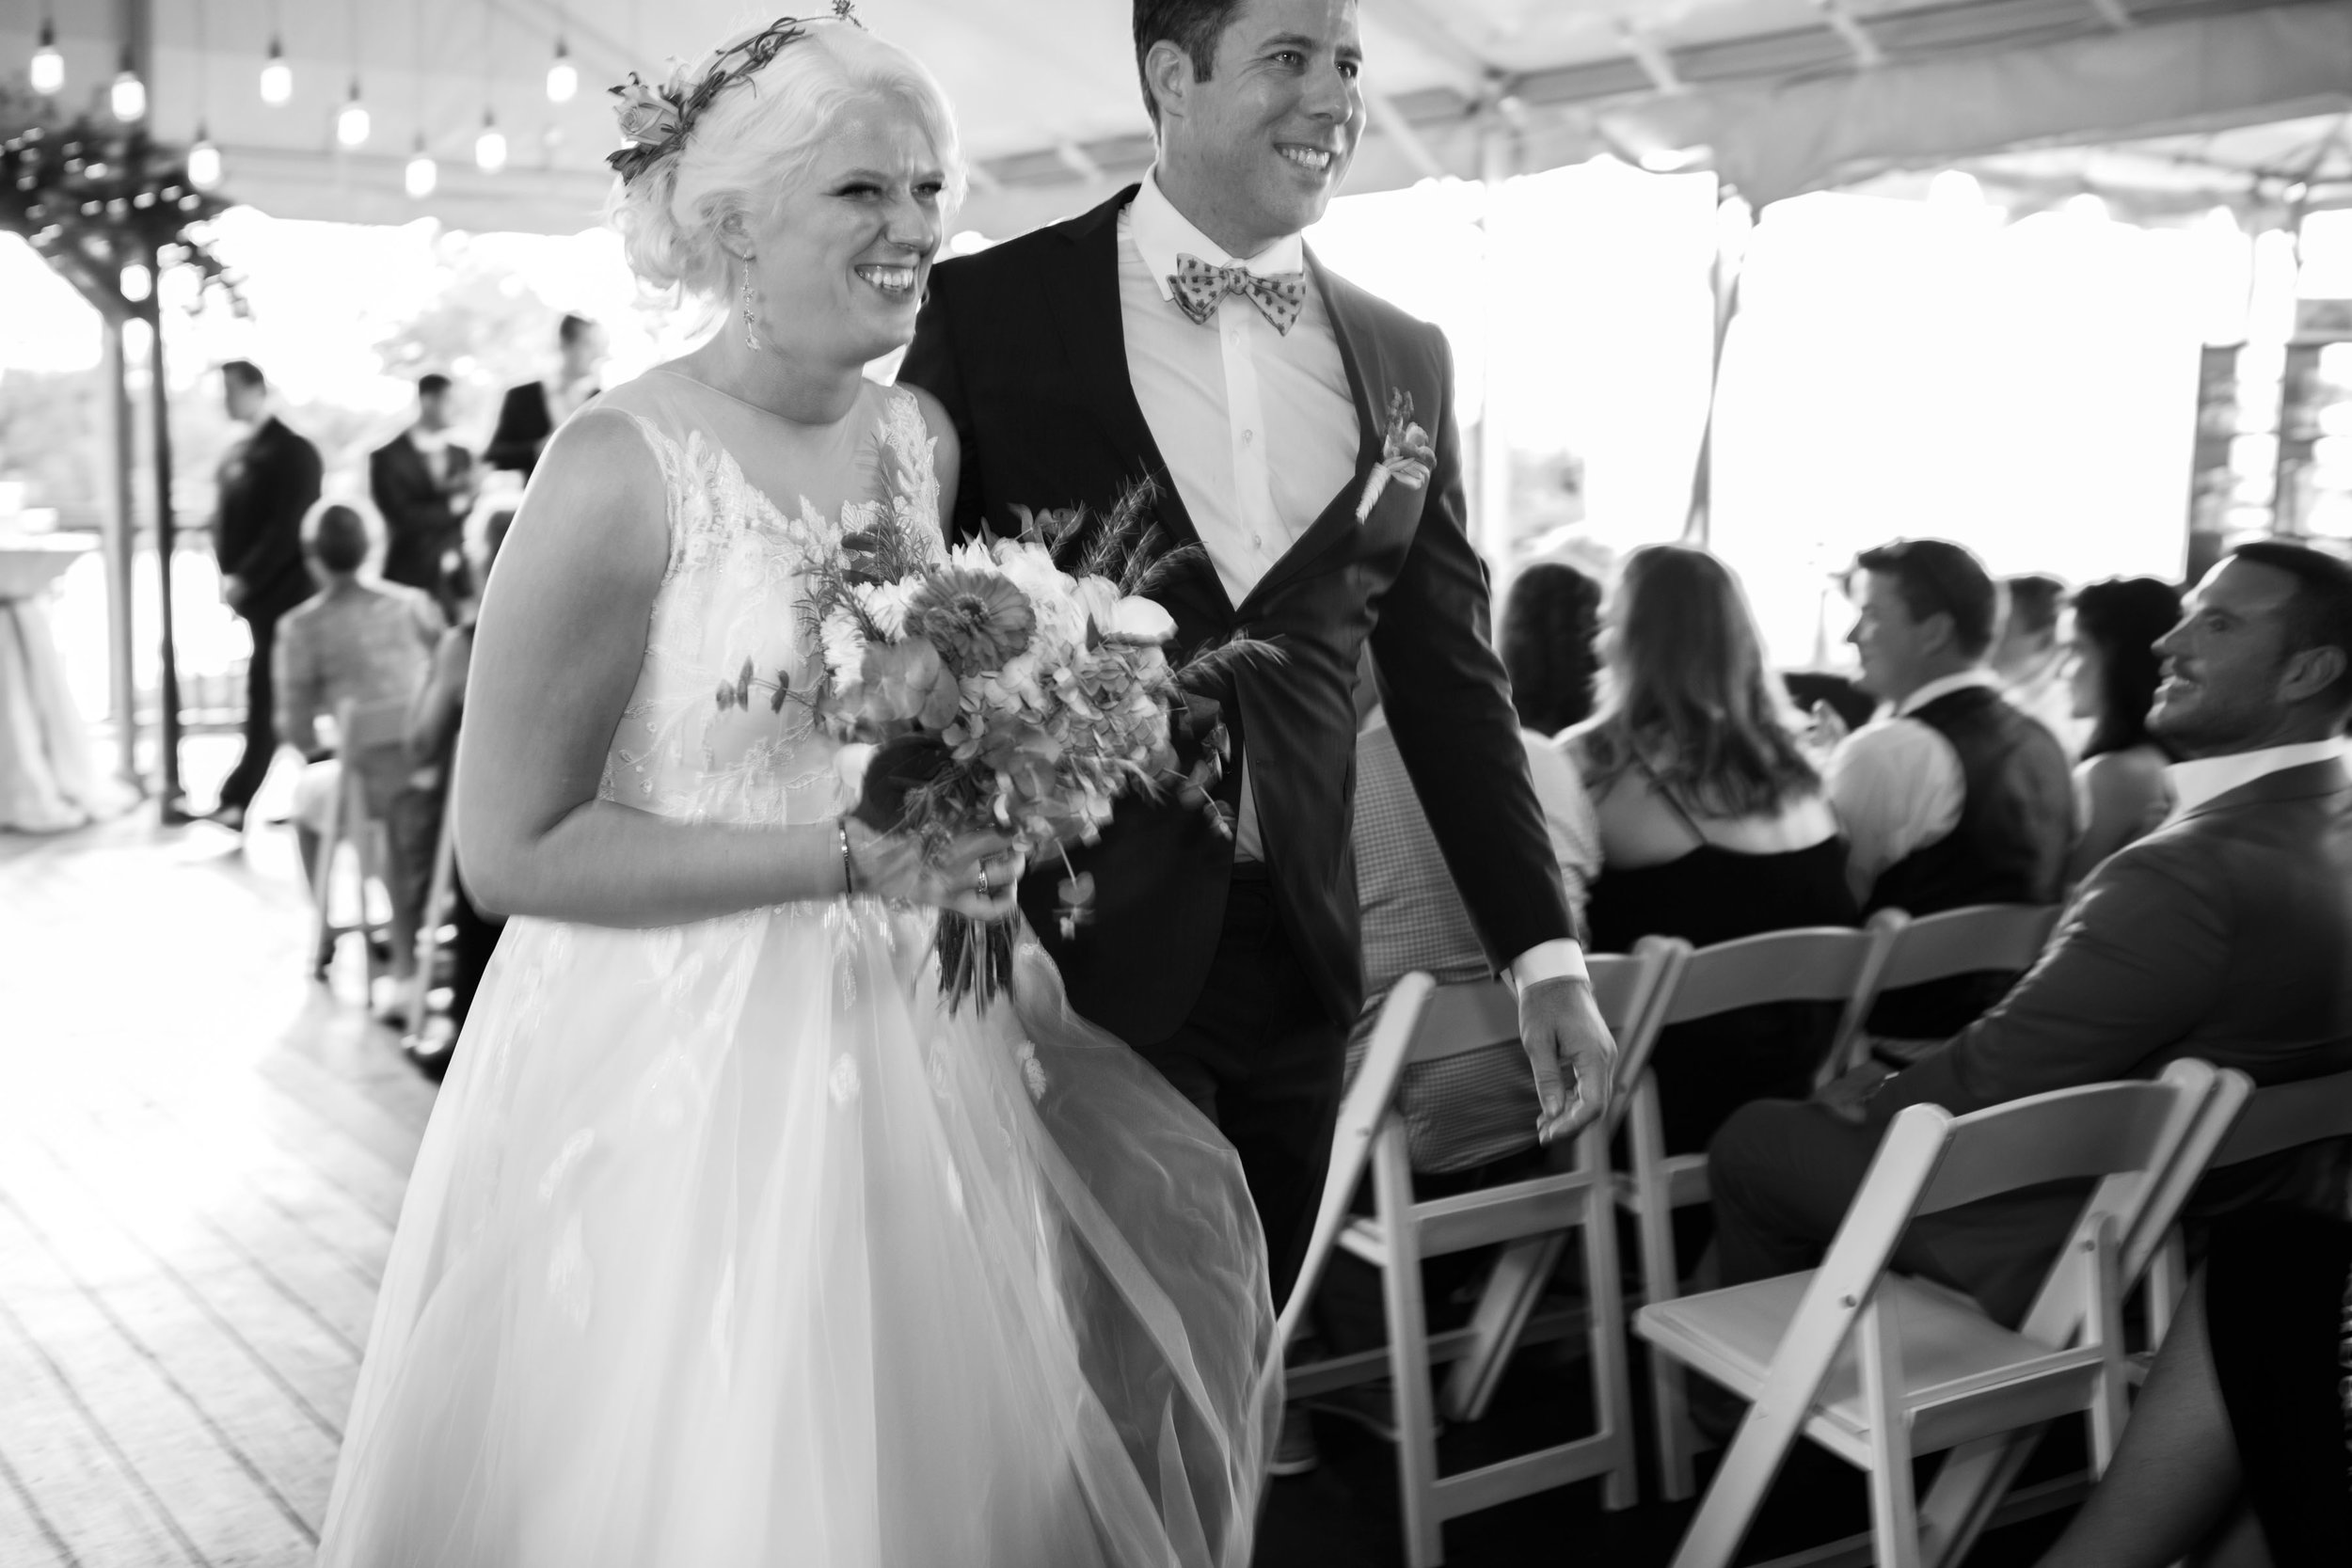 128-South-Wedding-Wilmington-NC-Photographer-Ceremony-27.1.jpg